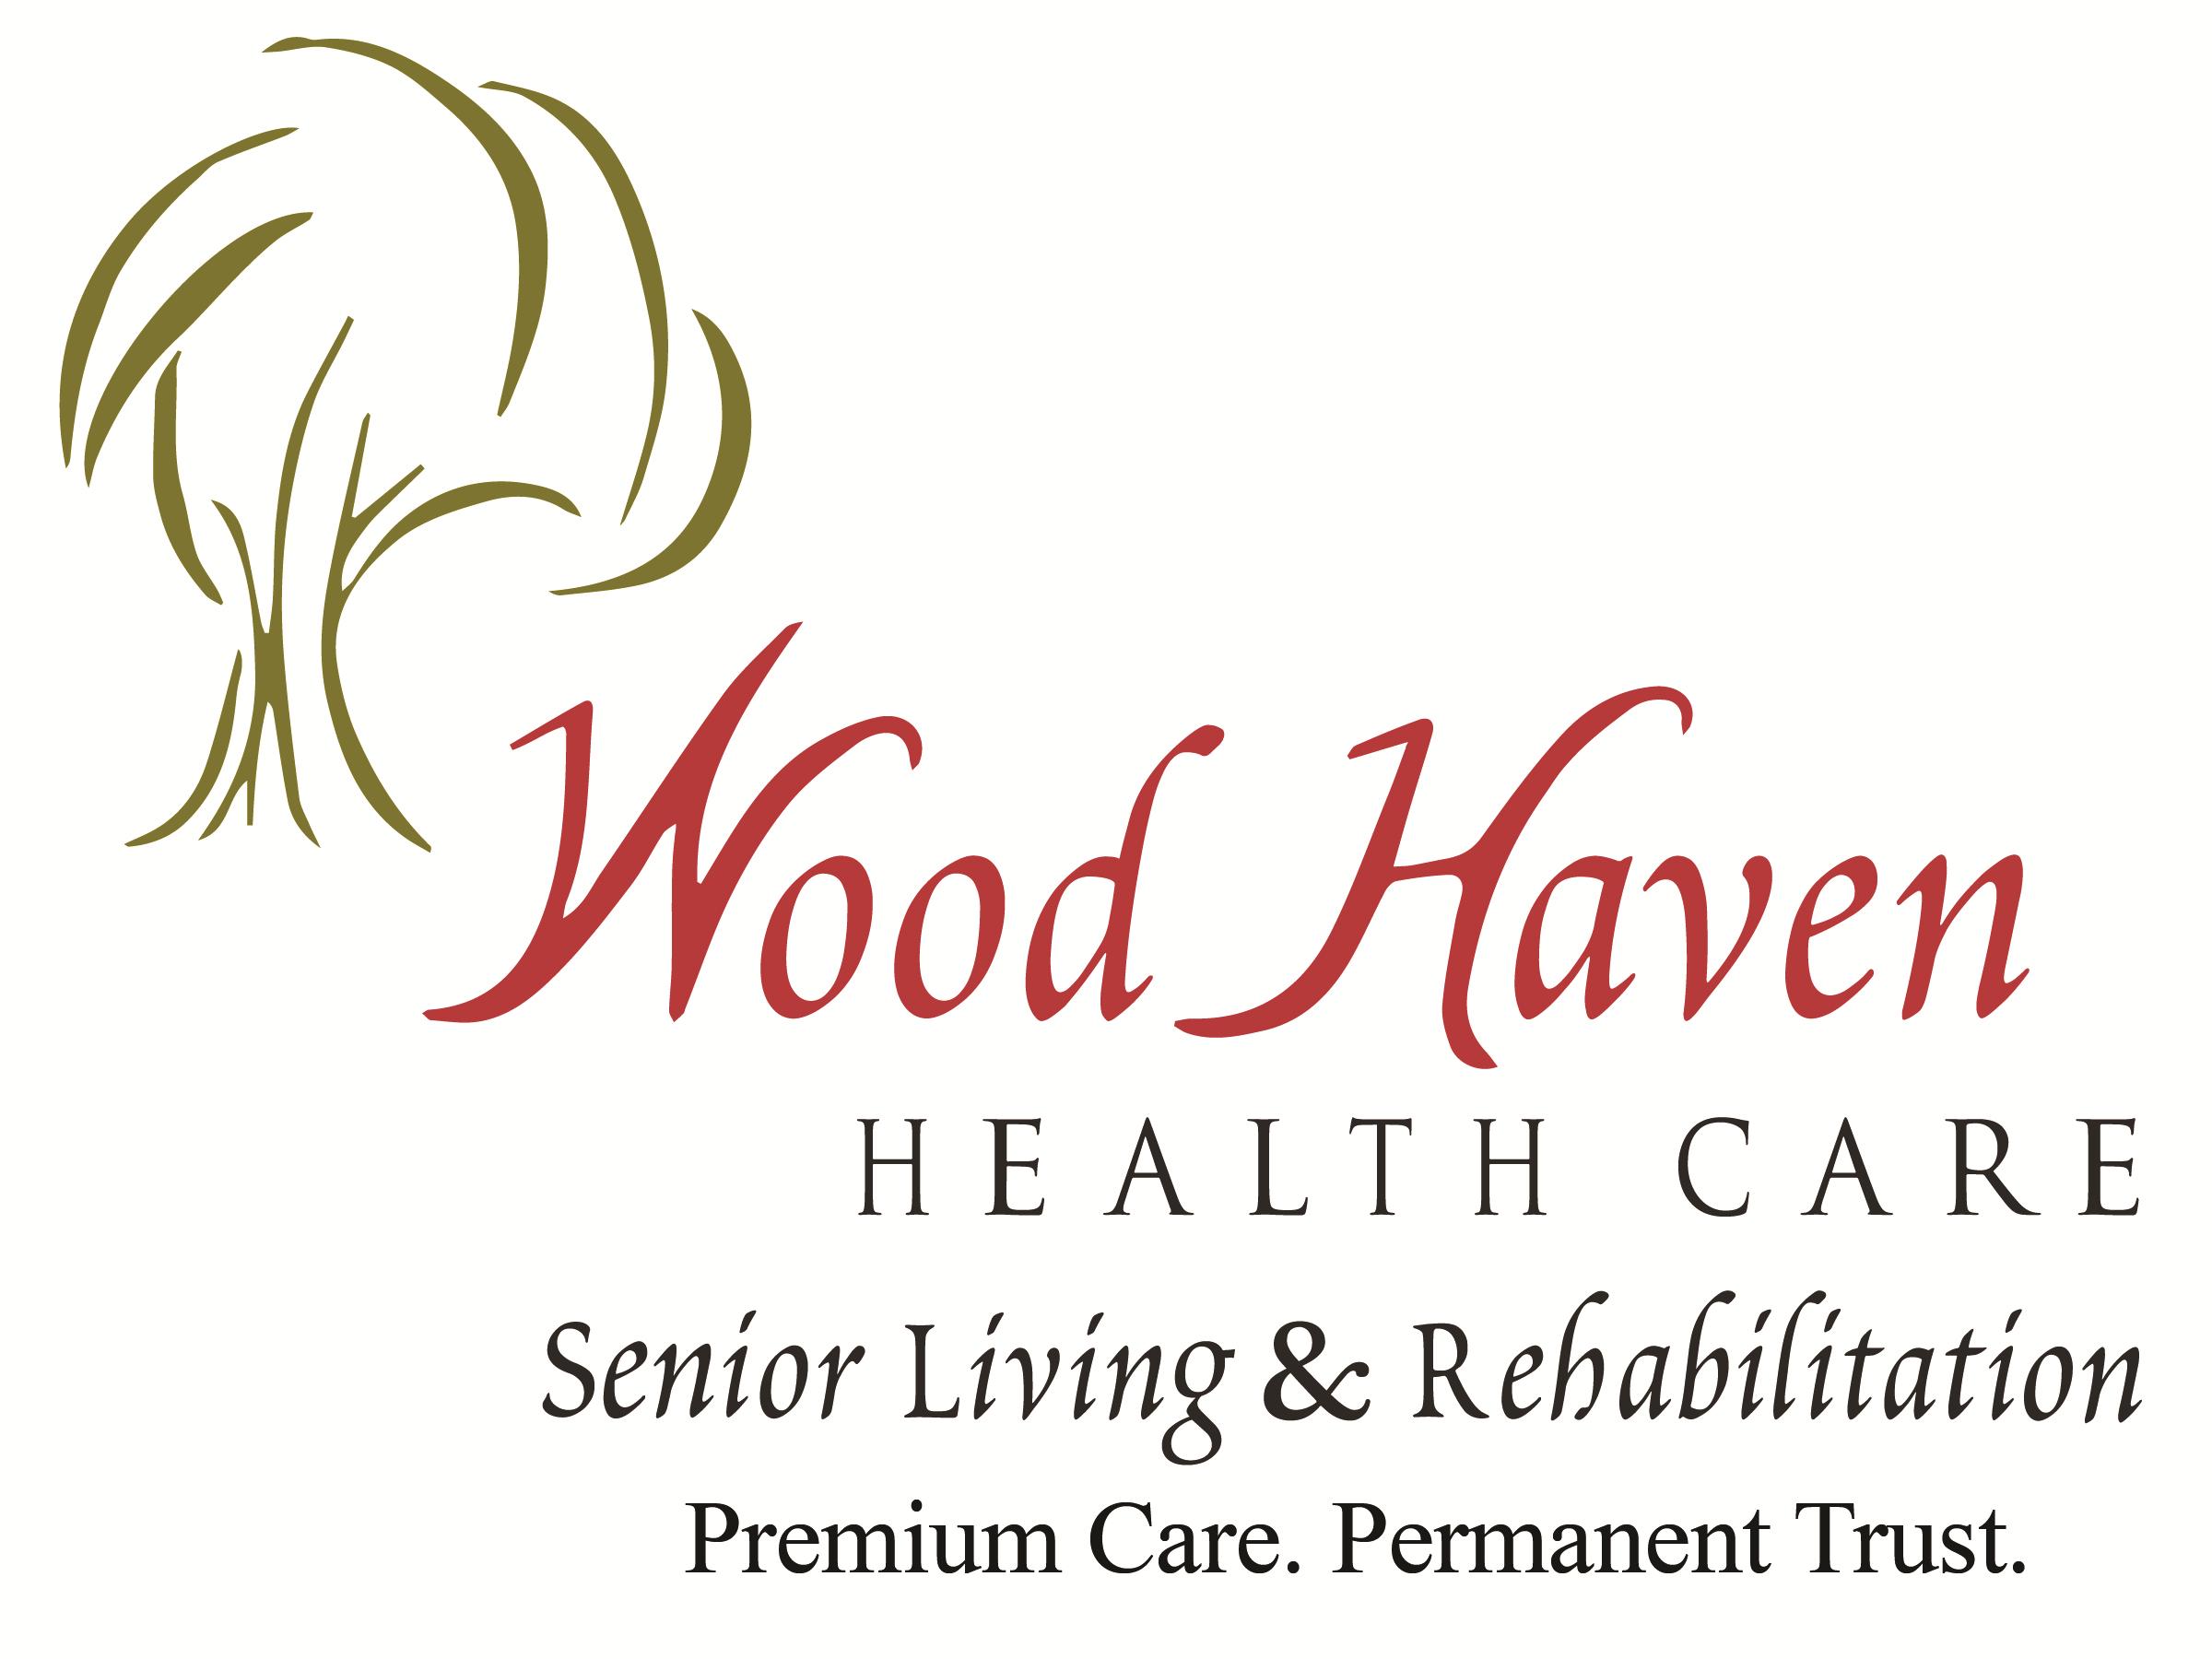 Wood Haven Health Care logo